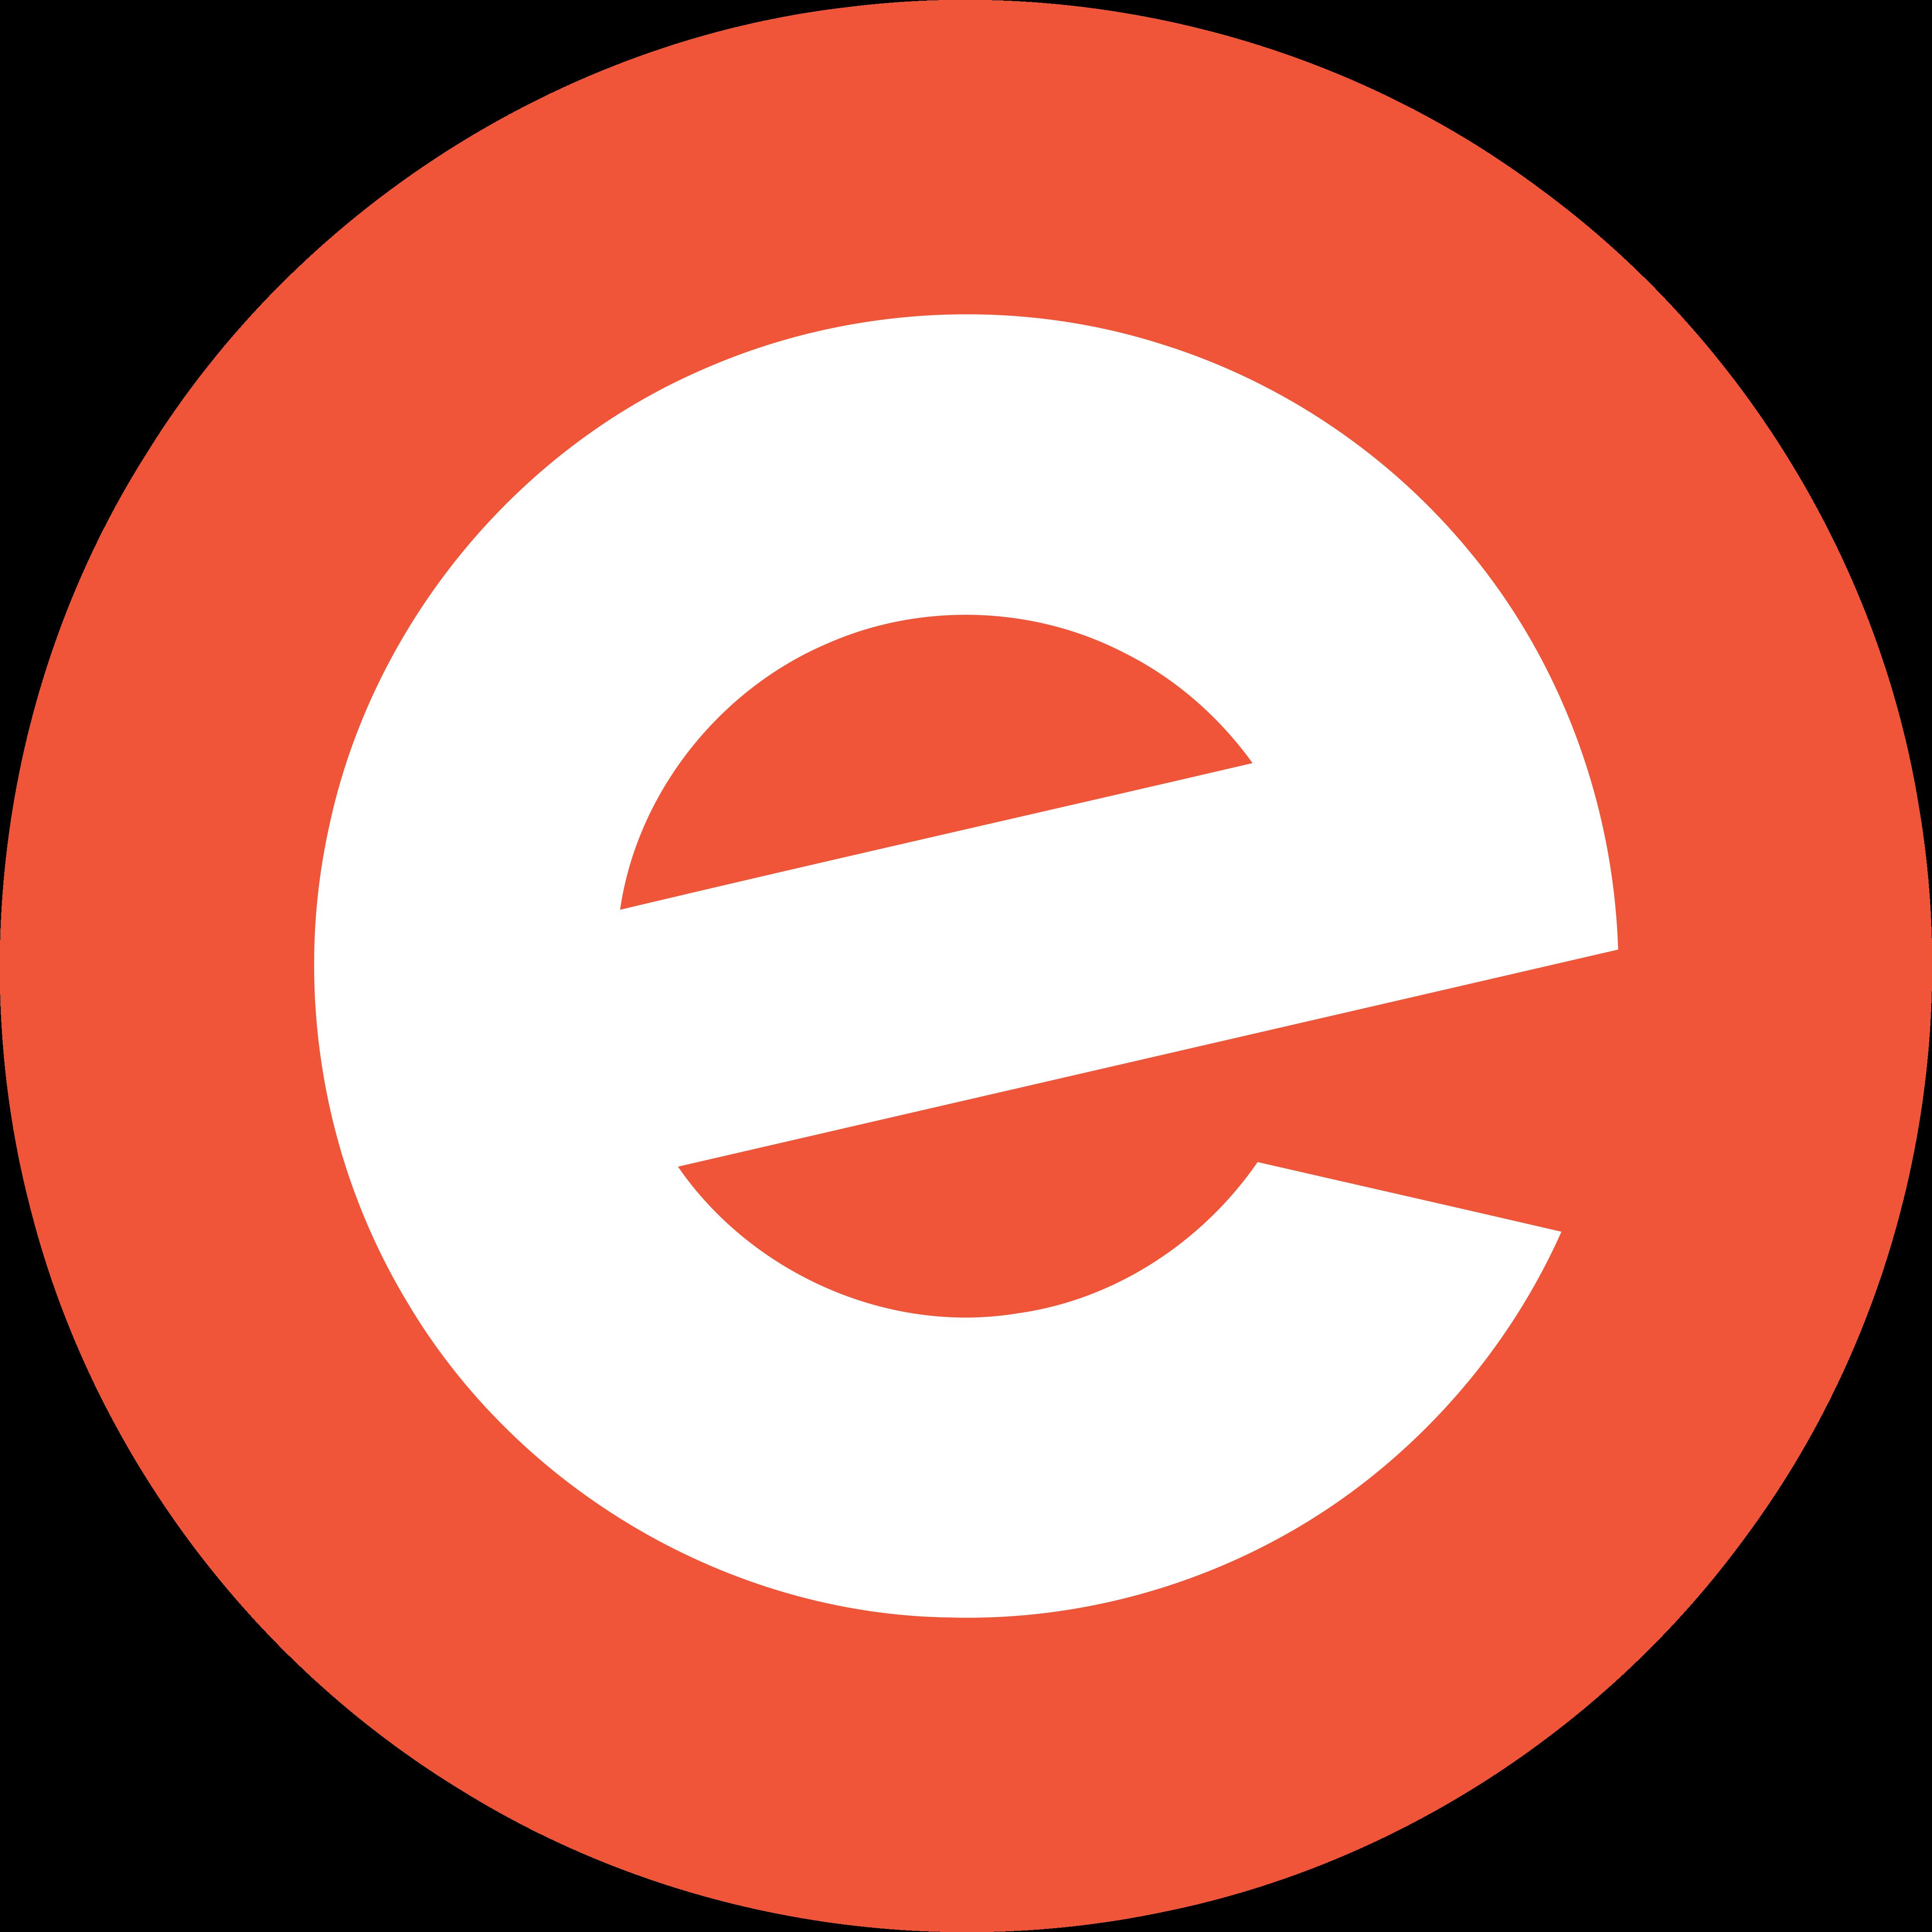 Eventbrite - Logos Download